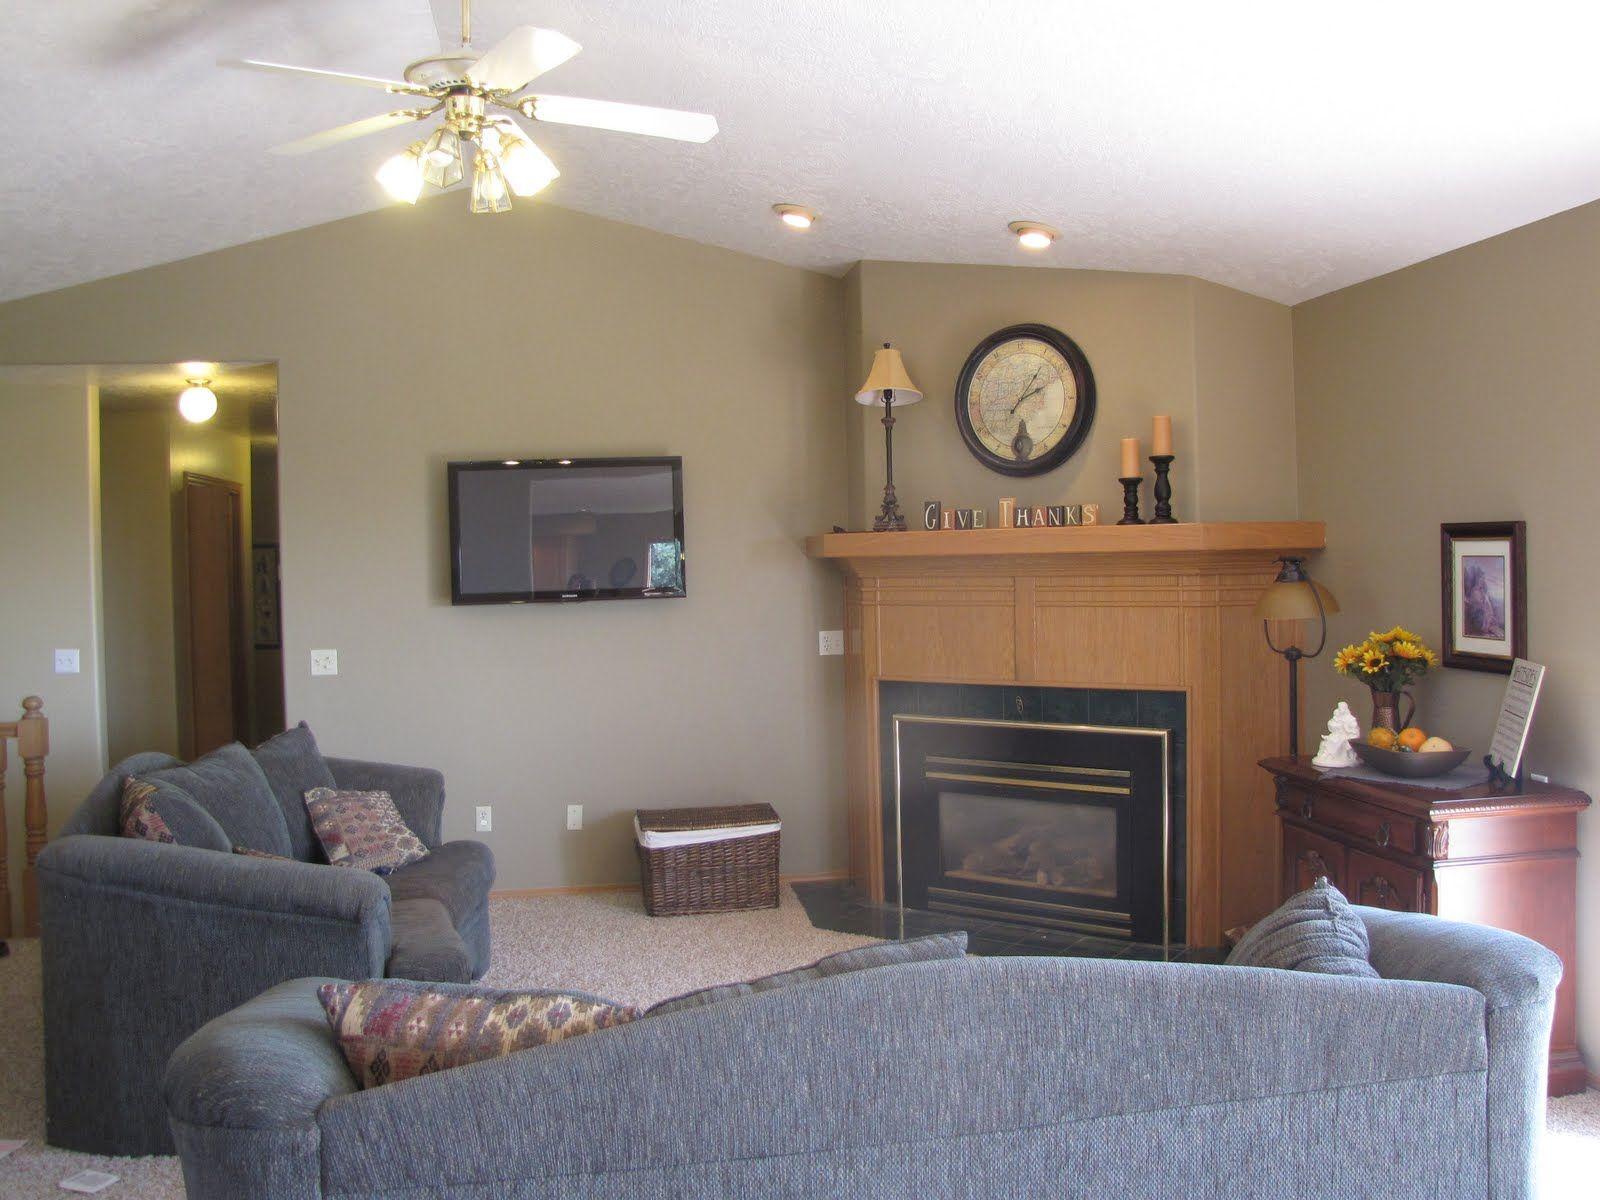 Paint Colors With Oak Trim My Home Style Pinterest